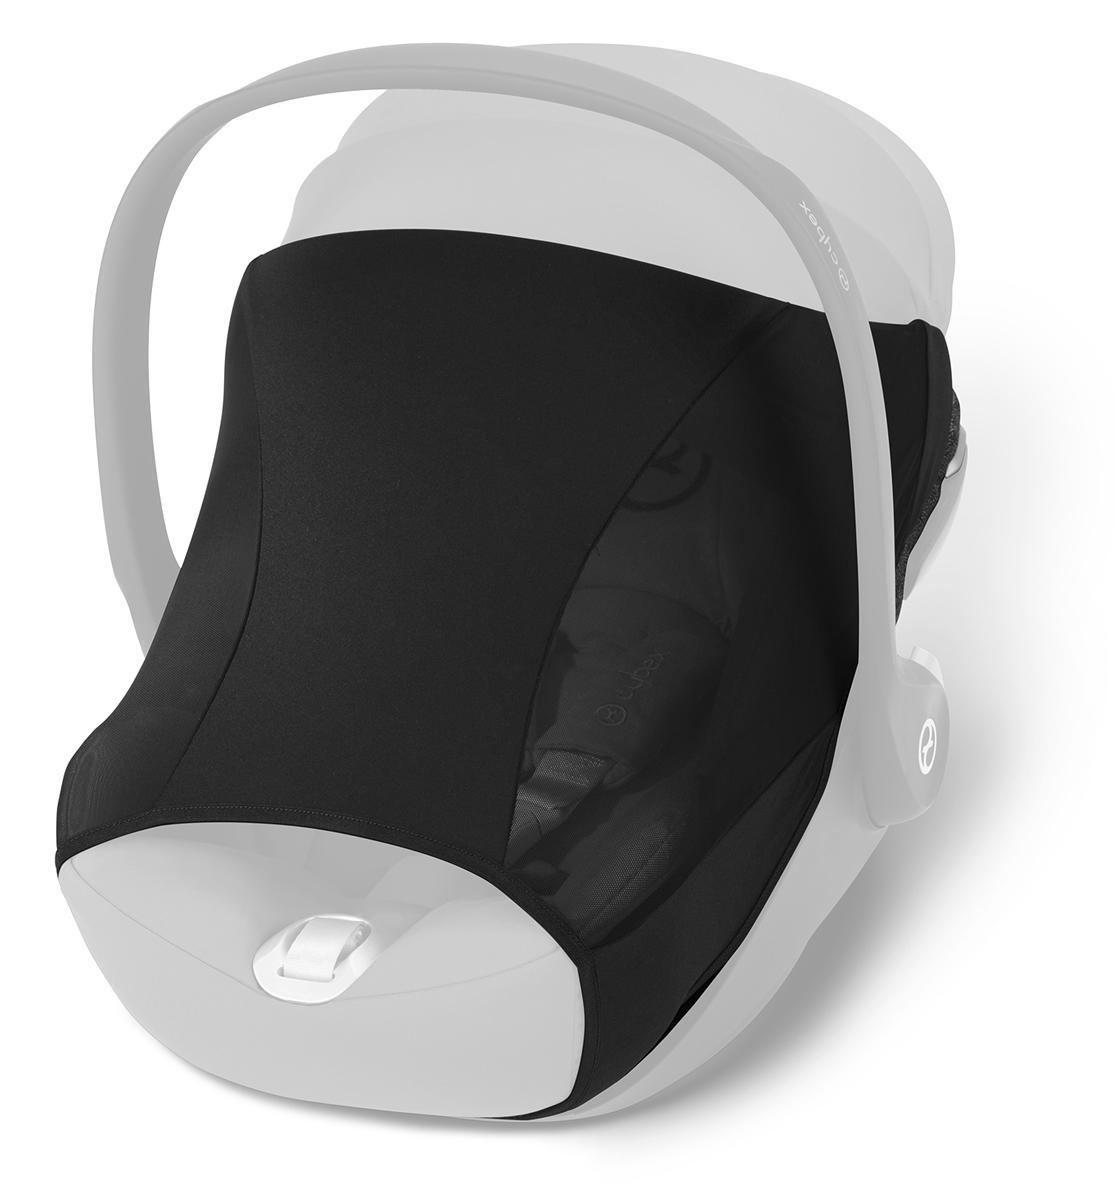 CYBEX Sun Shade Black for CYBEX Infant Car Seats Aton /& Cloud Child